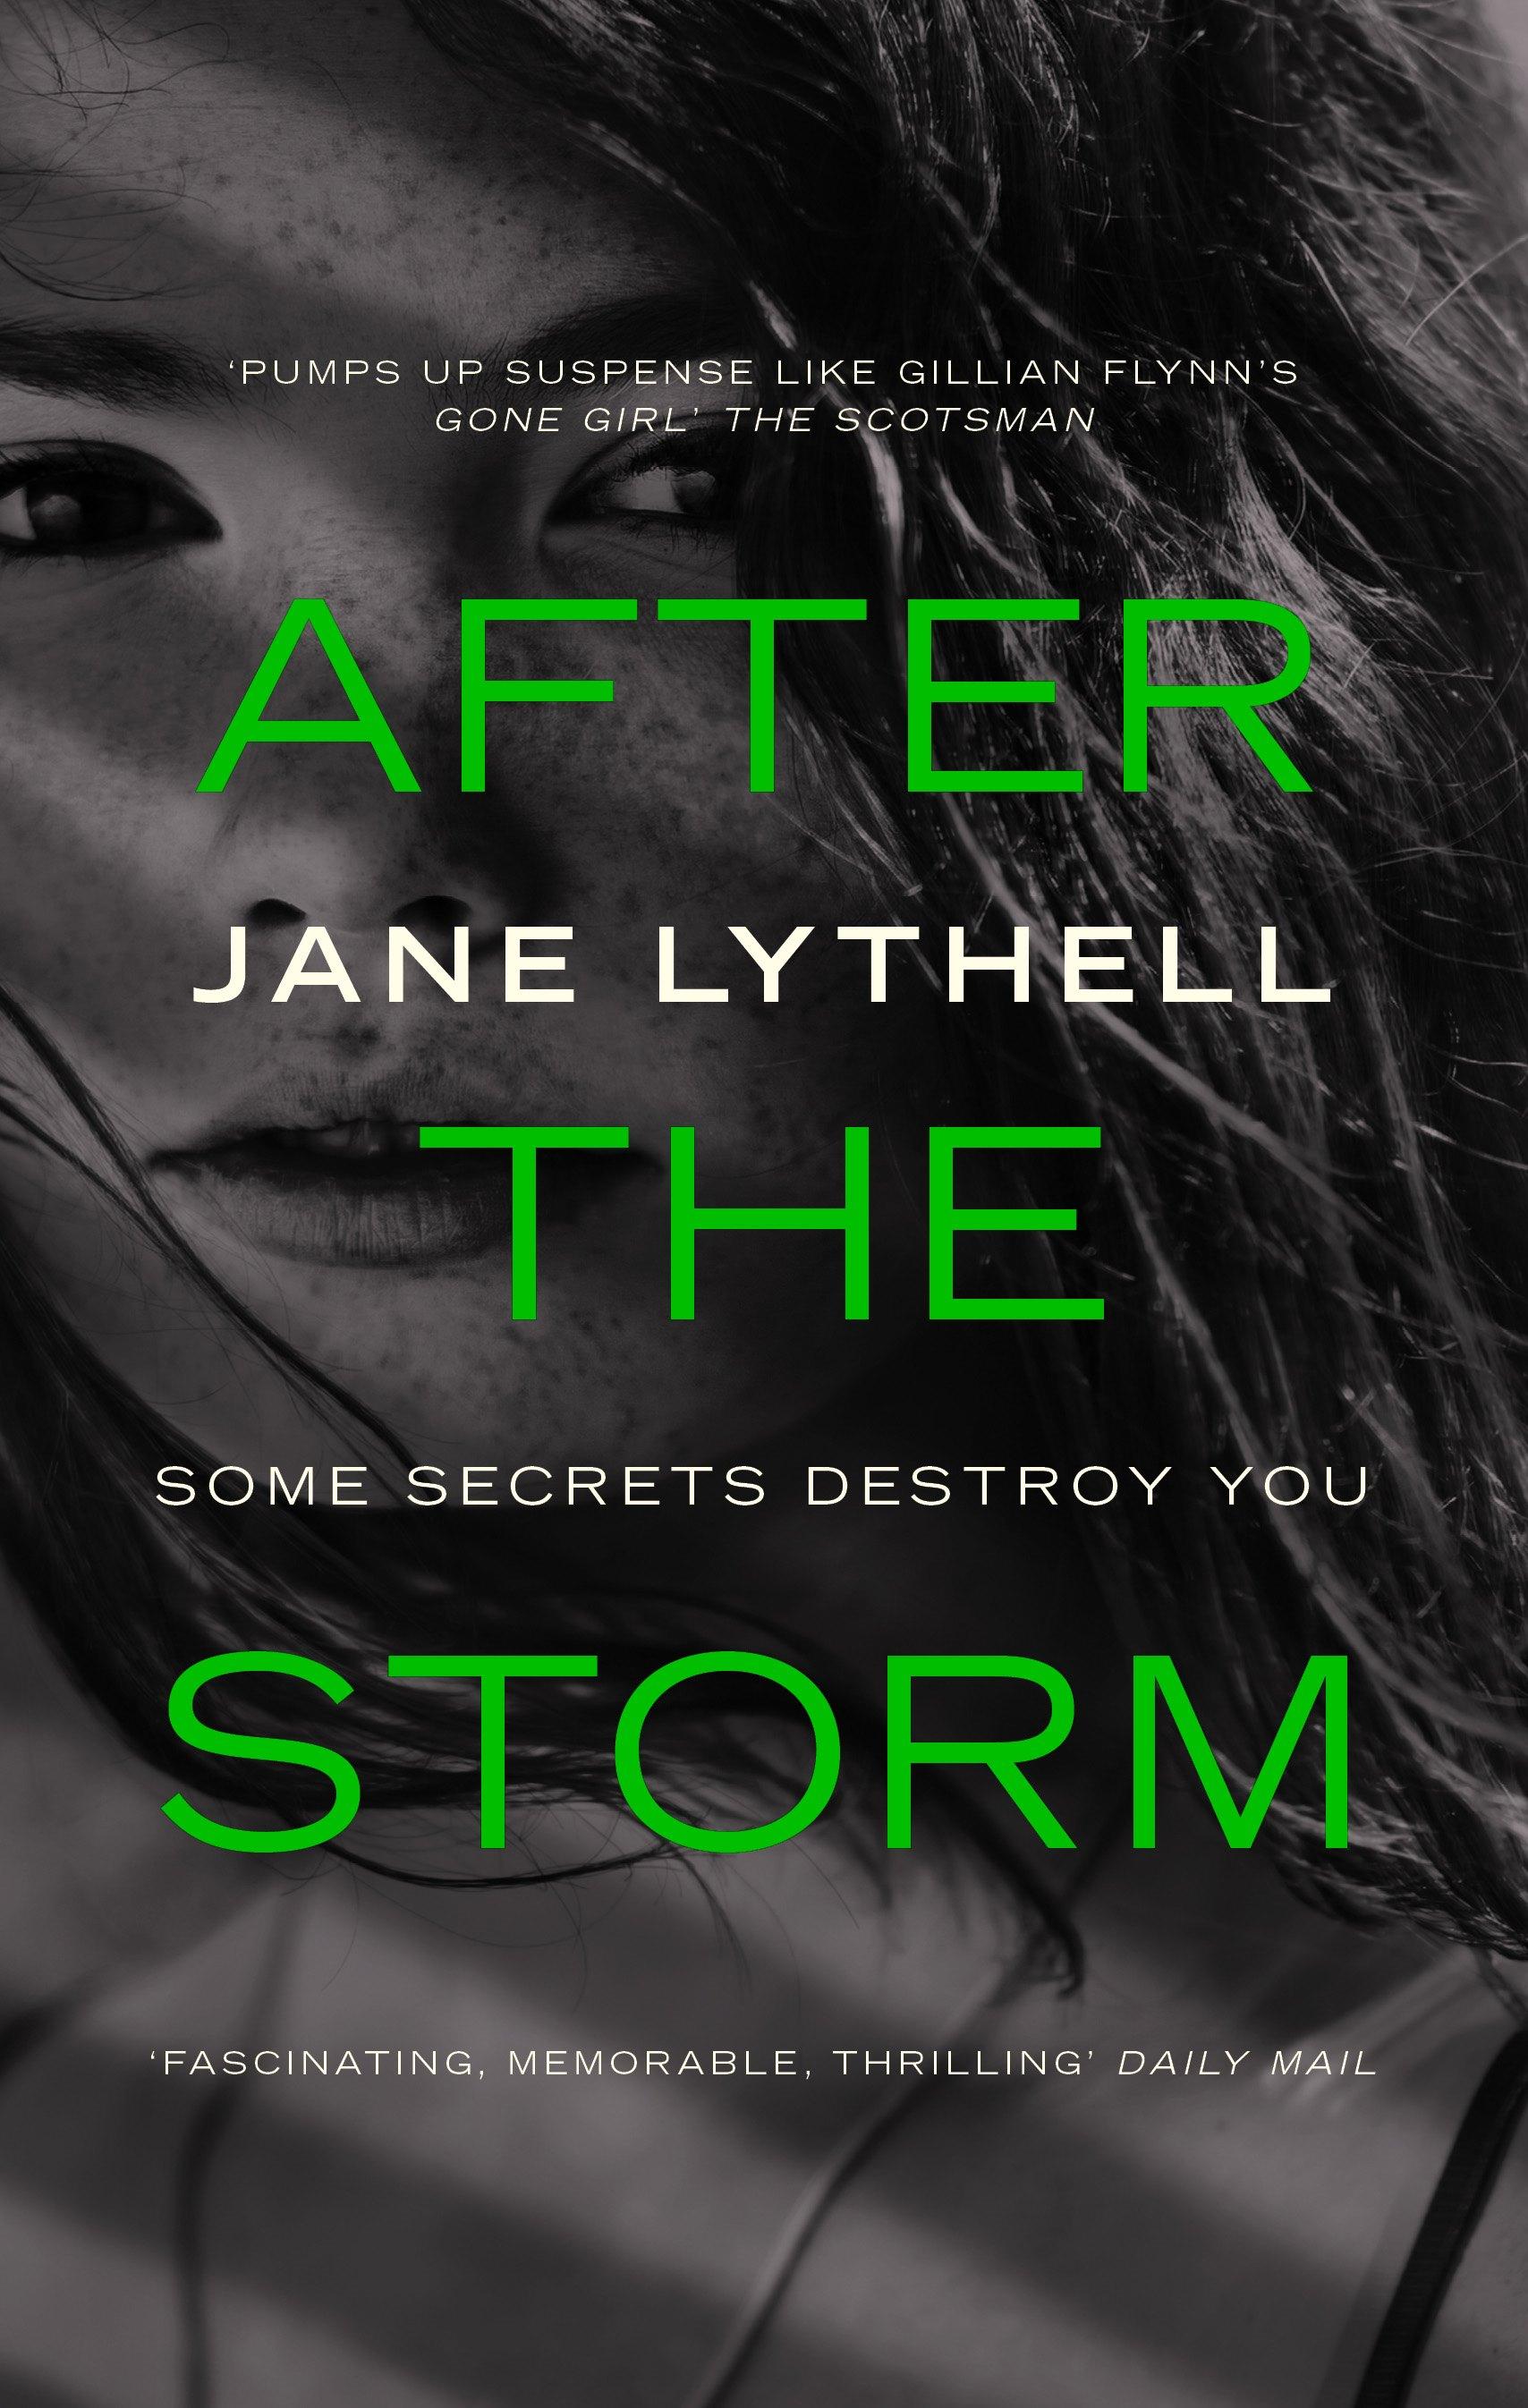 wpid-final-after-the-storm_jane-jpg